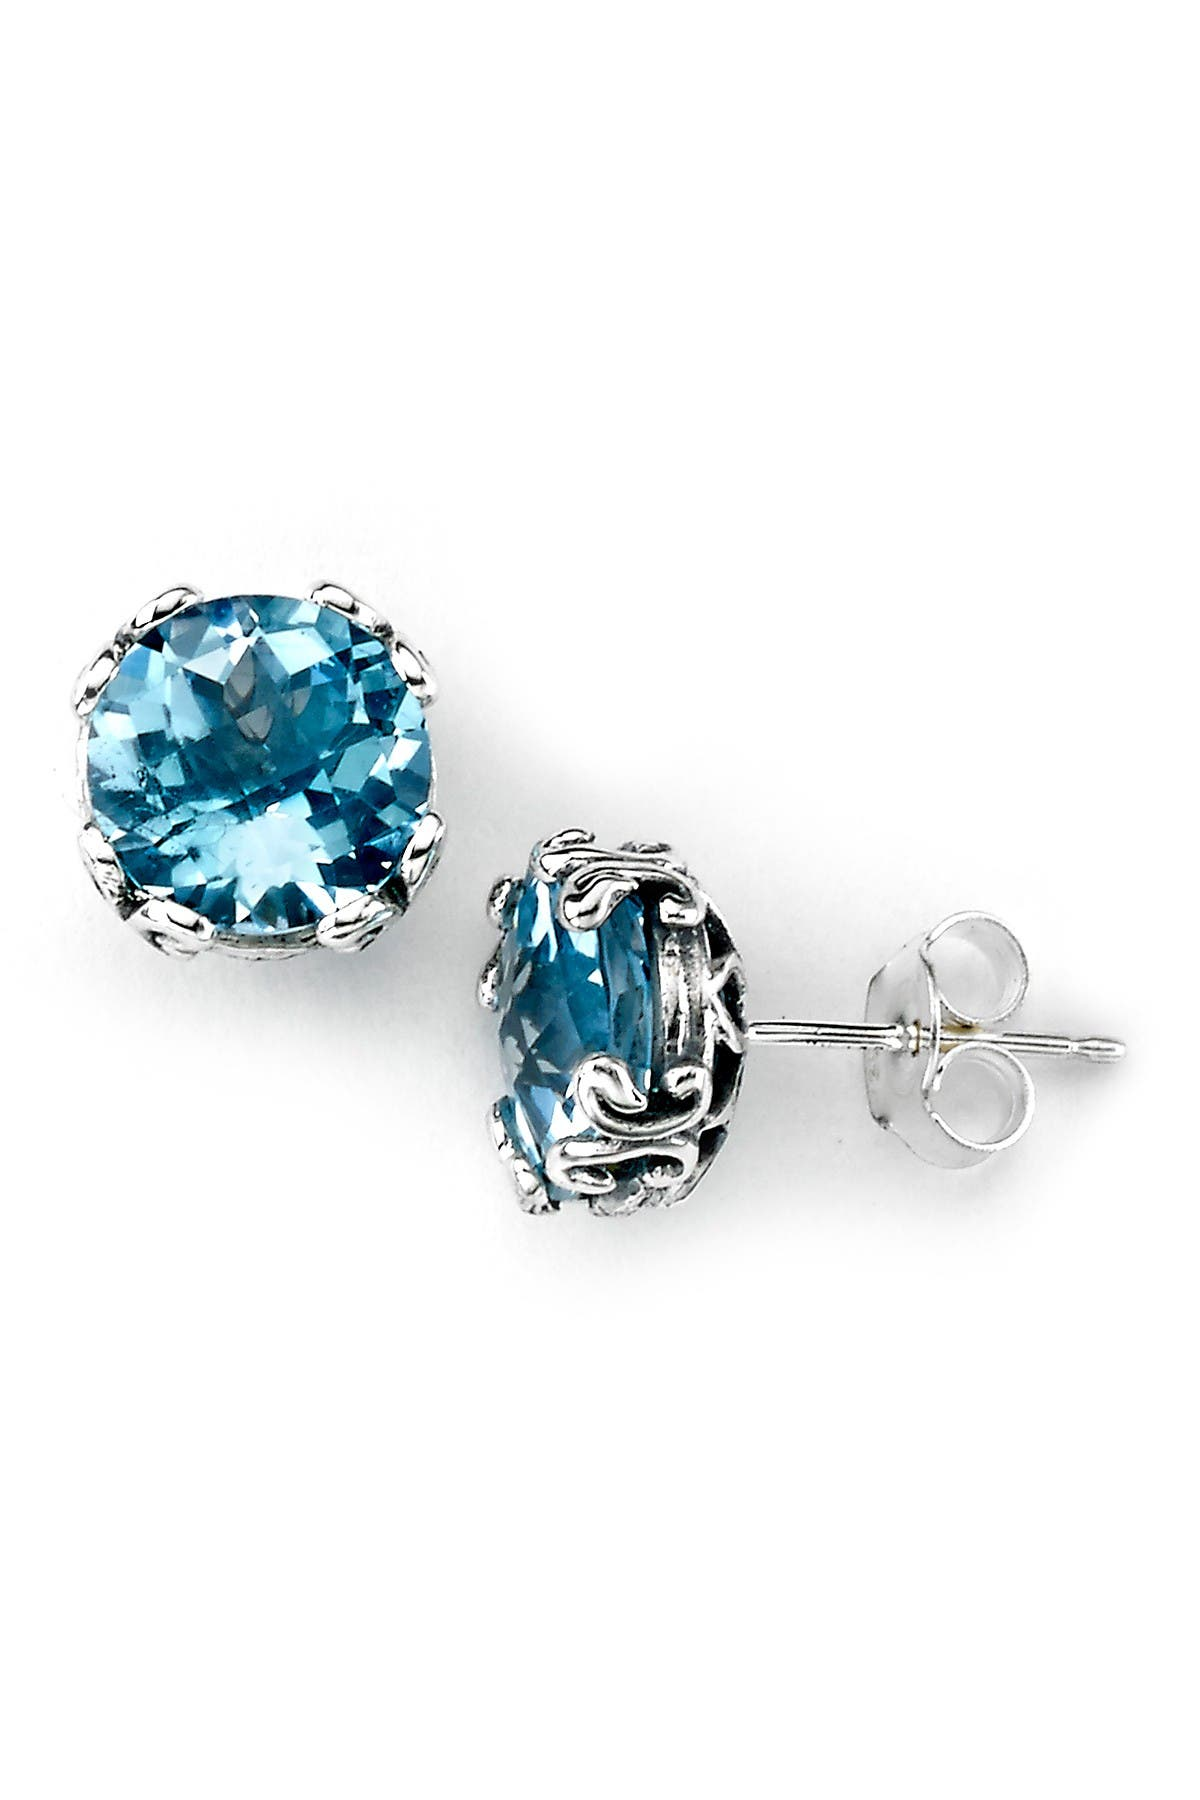 Image of Samuel B Jewelry Sterling Silver Round Blue Topaz Stud Earrings